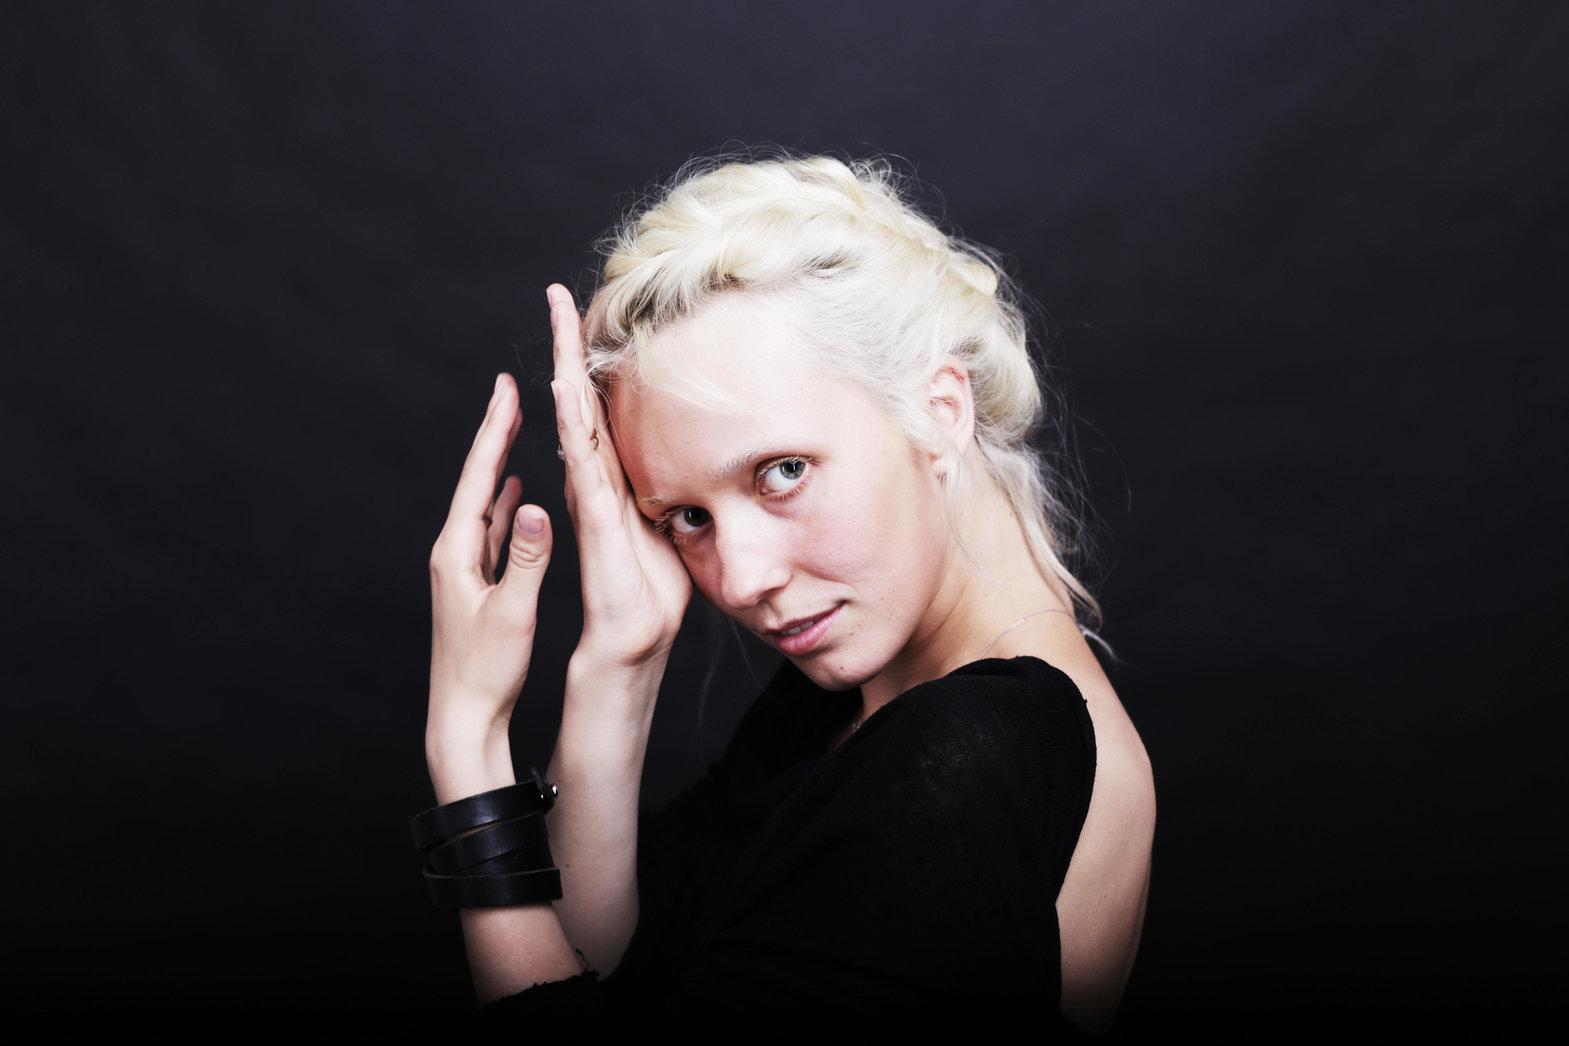 Светлана смирнова марцинкевич фото ню 10 фотография